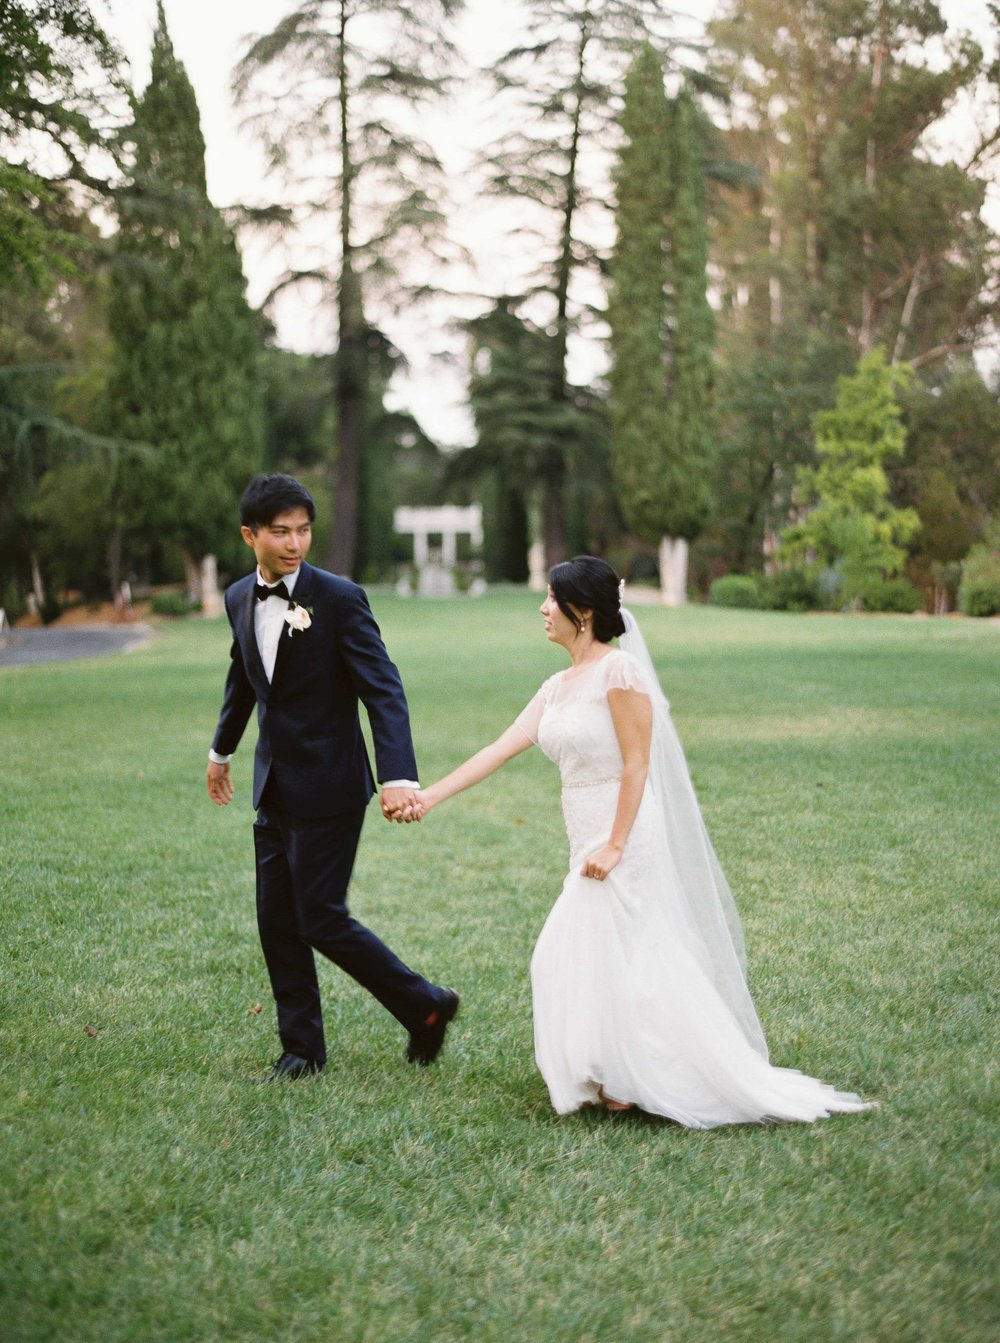 Villa_Montalvo_Wedding_Photographer_Videographer_San_Francisco195.jpg